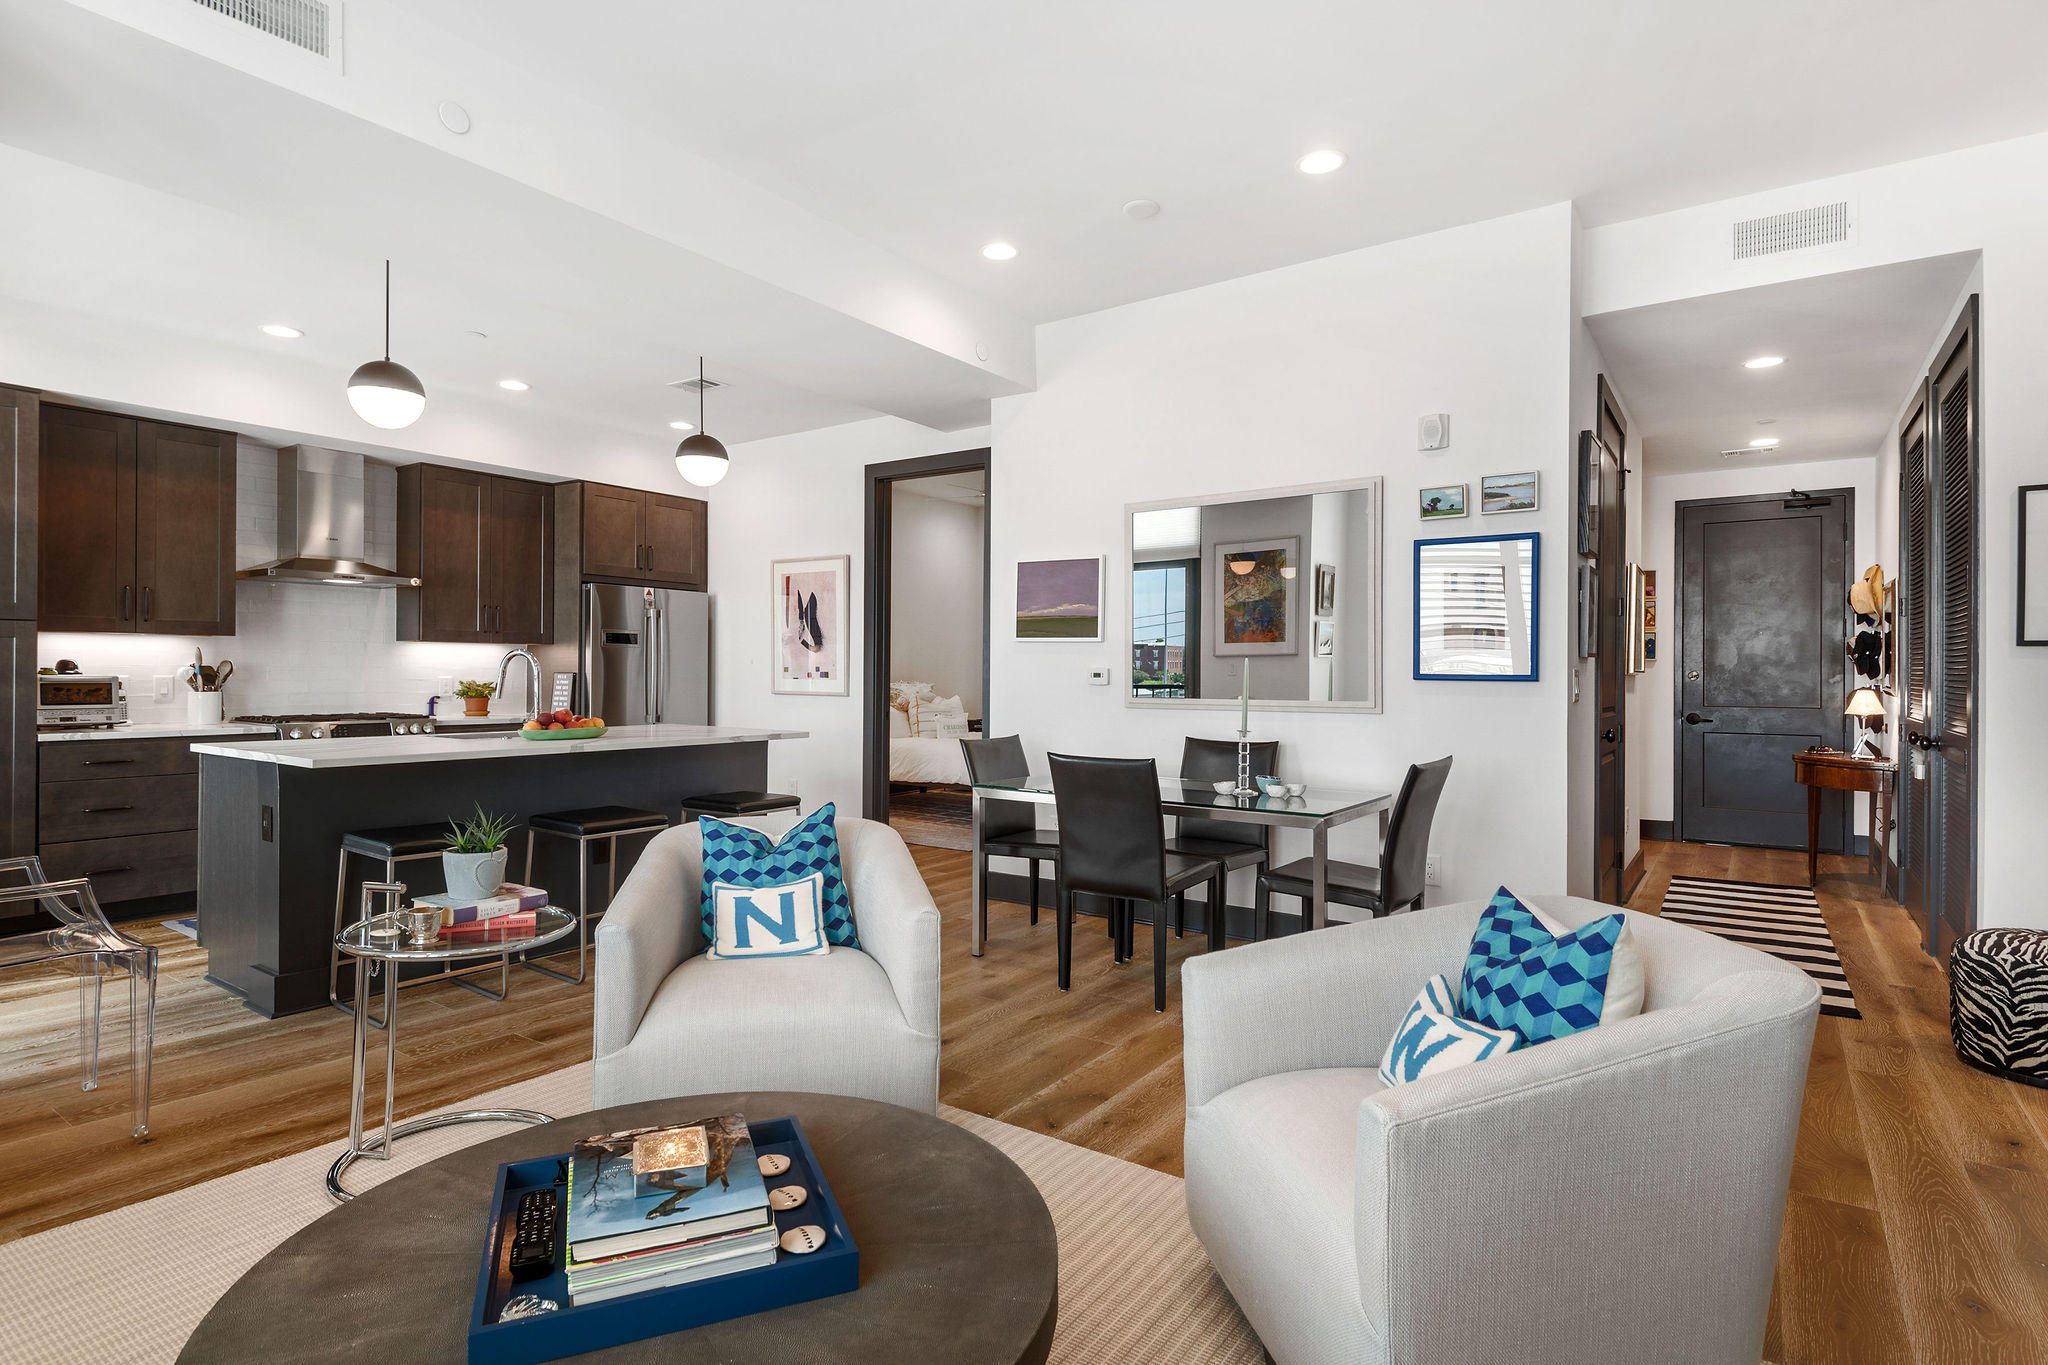 Gadsdenboro Homes For Sale - 5 Gadsdenboro, Charleston, SC - 29